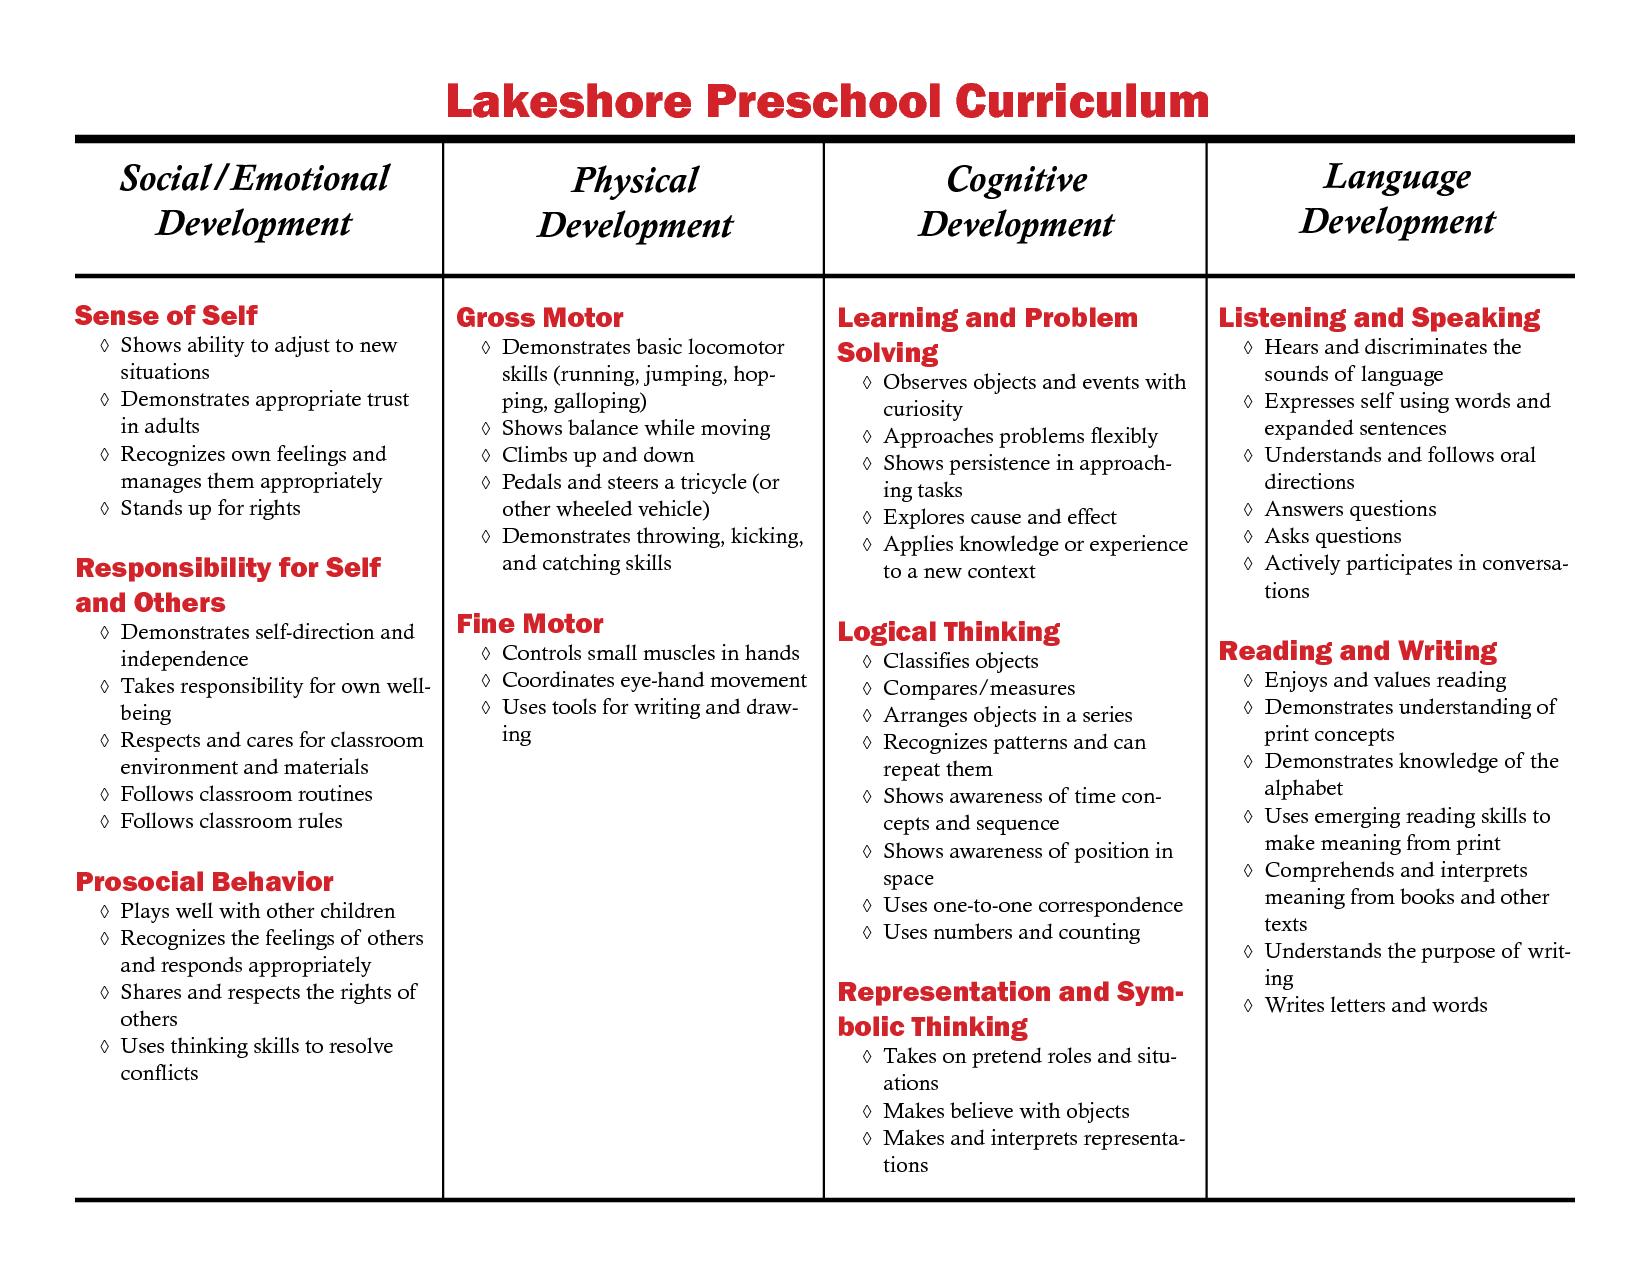 Preschool Curriculum Themes   for preschoolers developmental ...